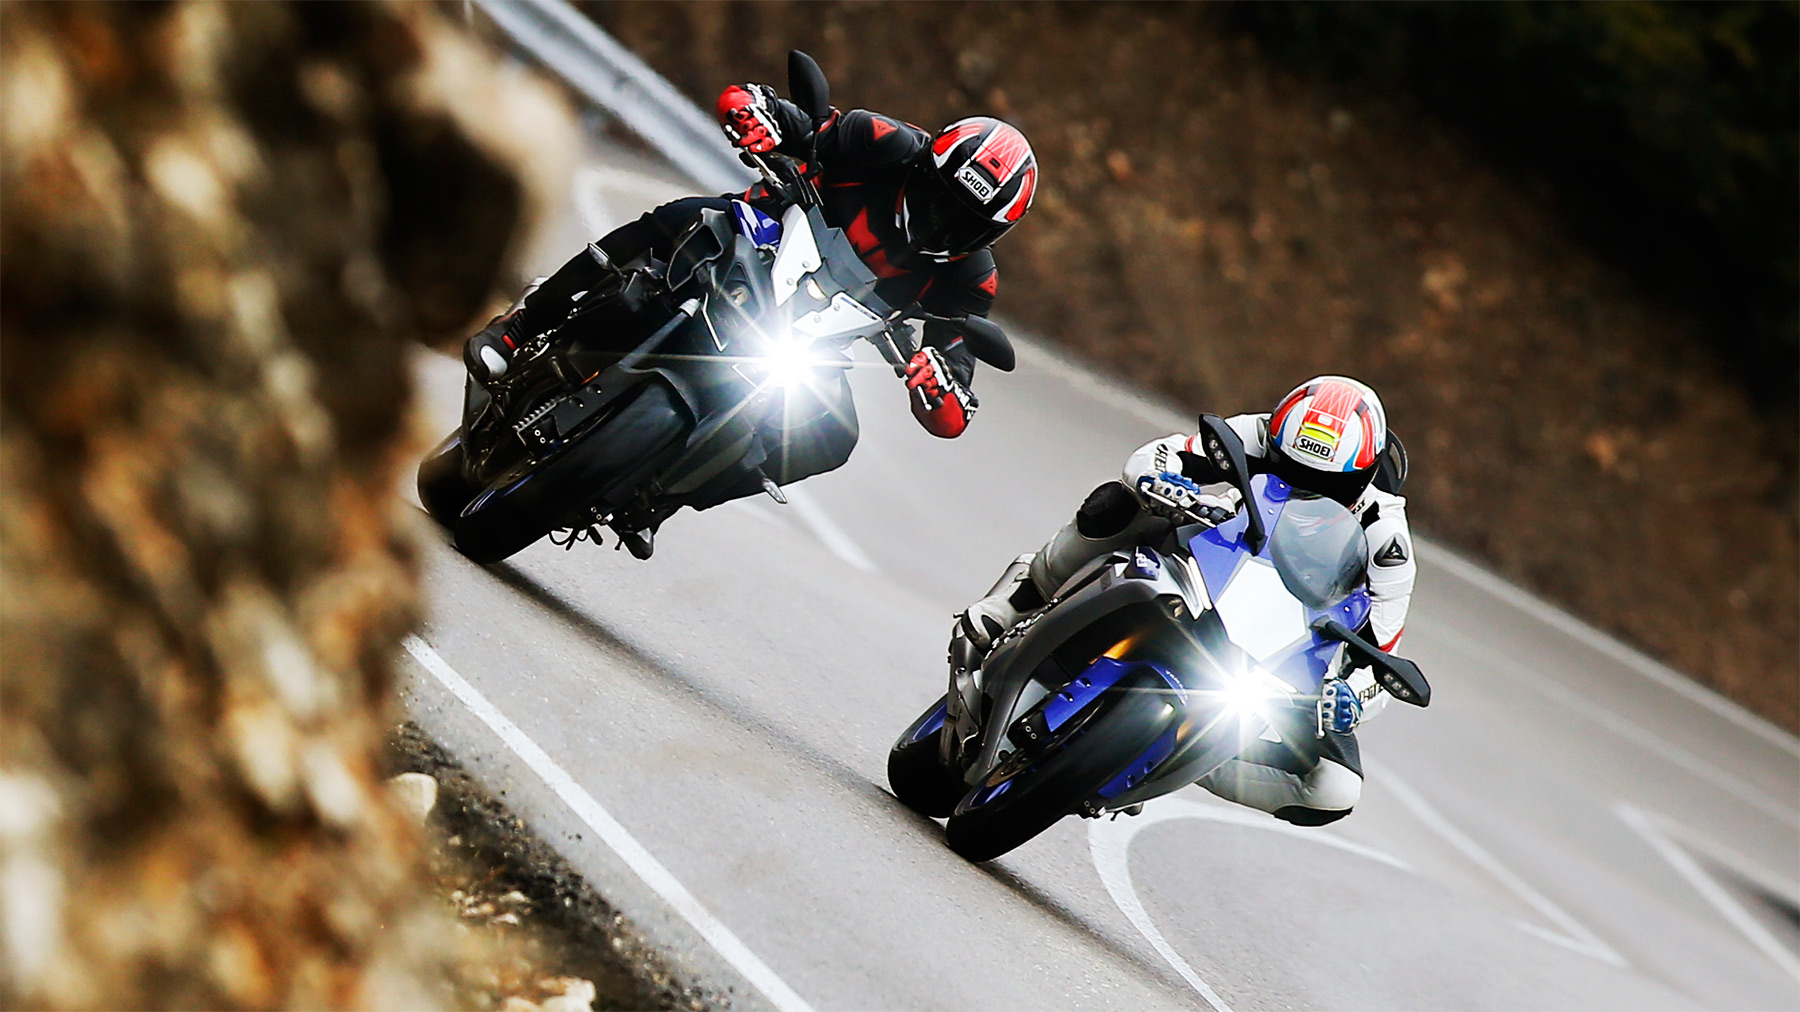 Comparativa Yamaha YZF-R1 vs Yamaha MT-10 2017, cara a cara